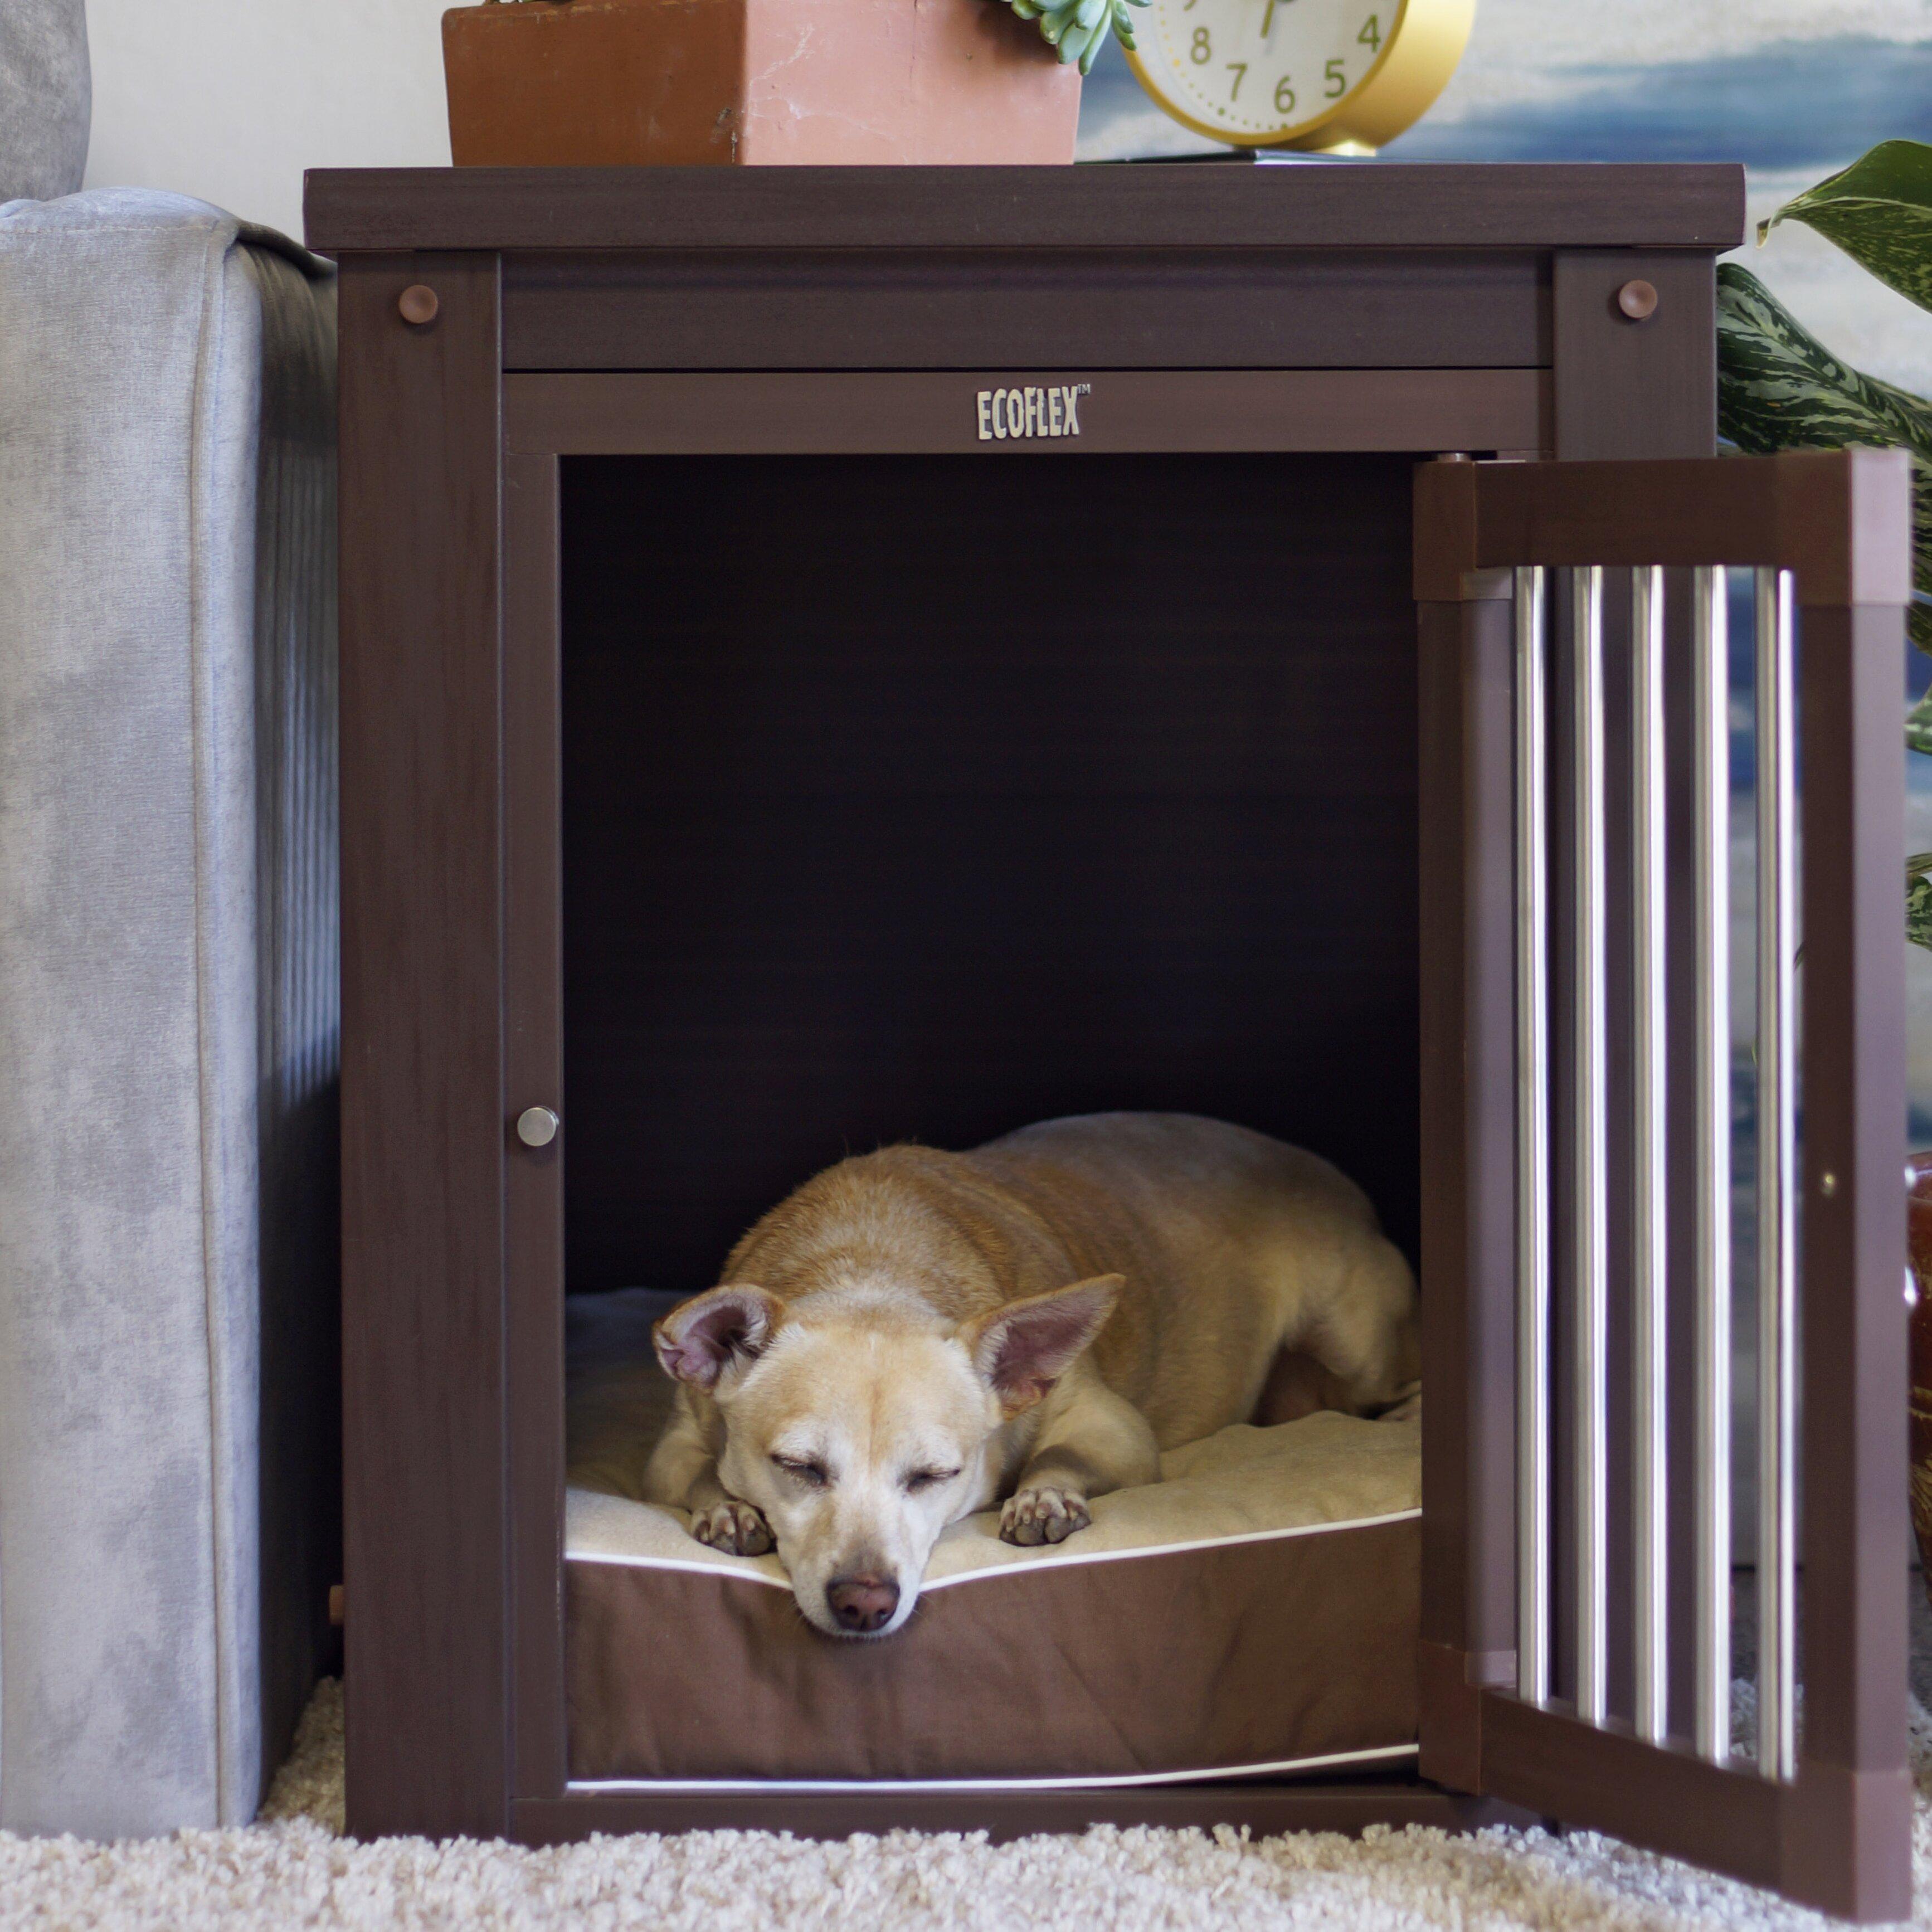 New Age Pet Ecoflex Dog Crate